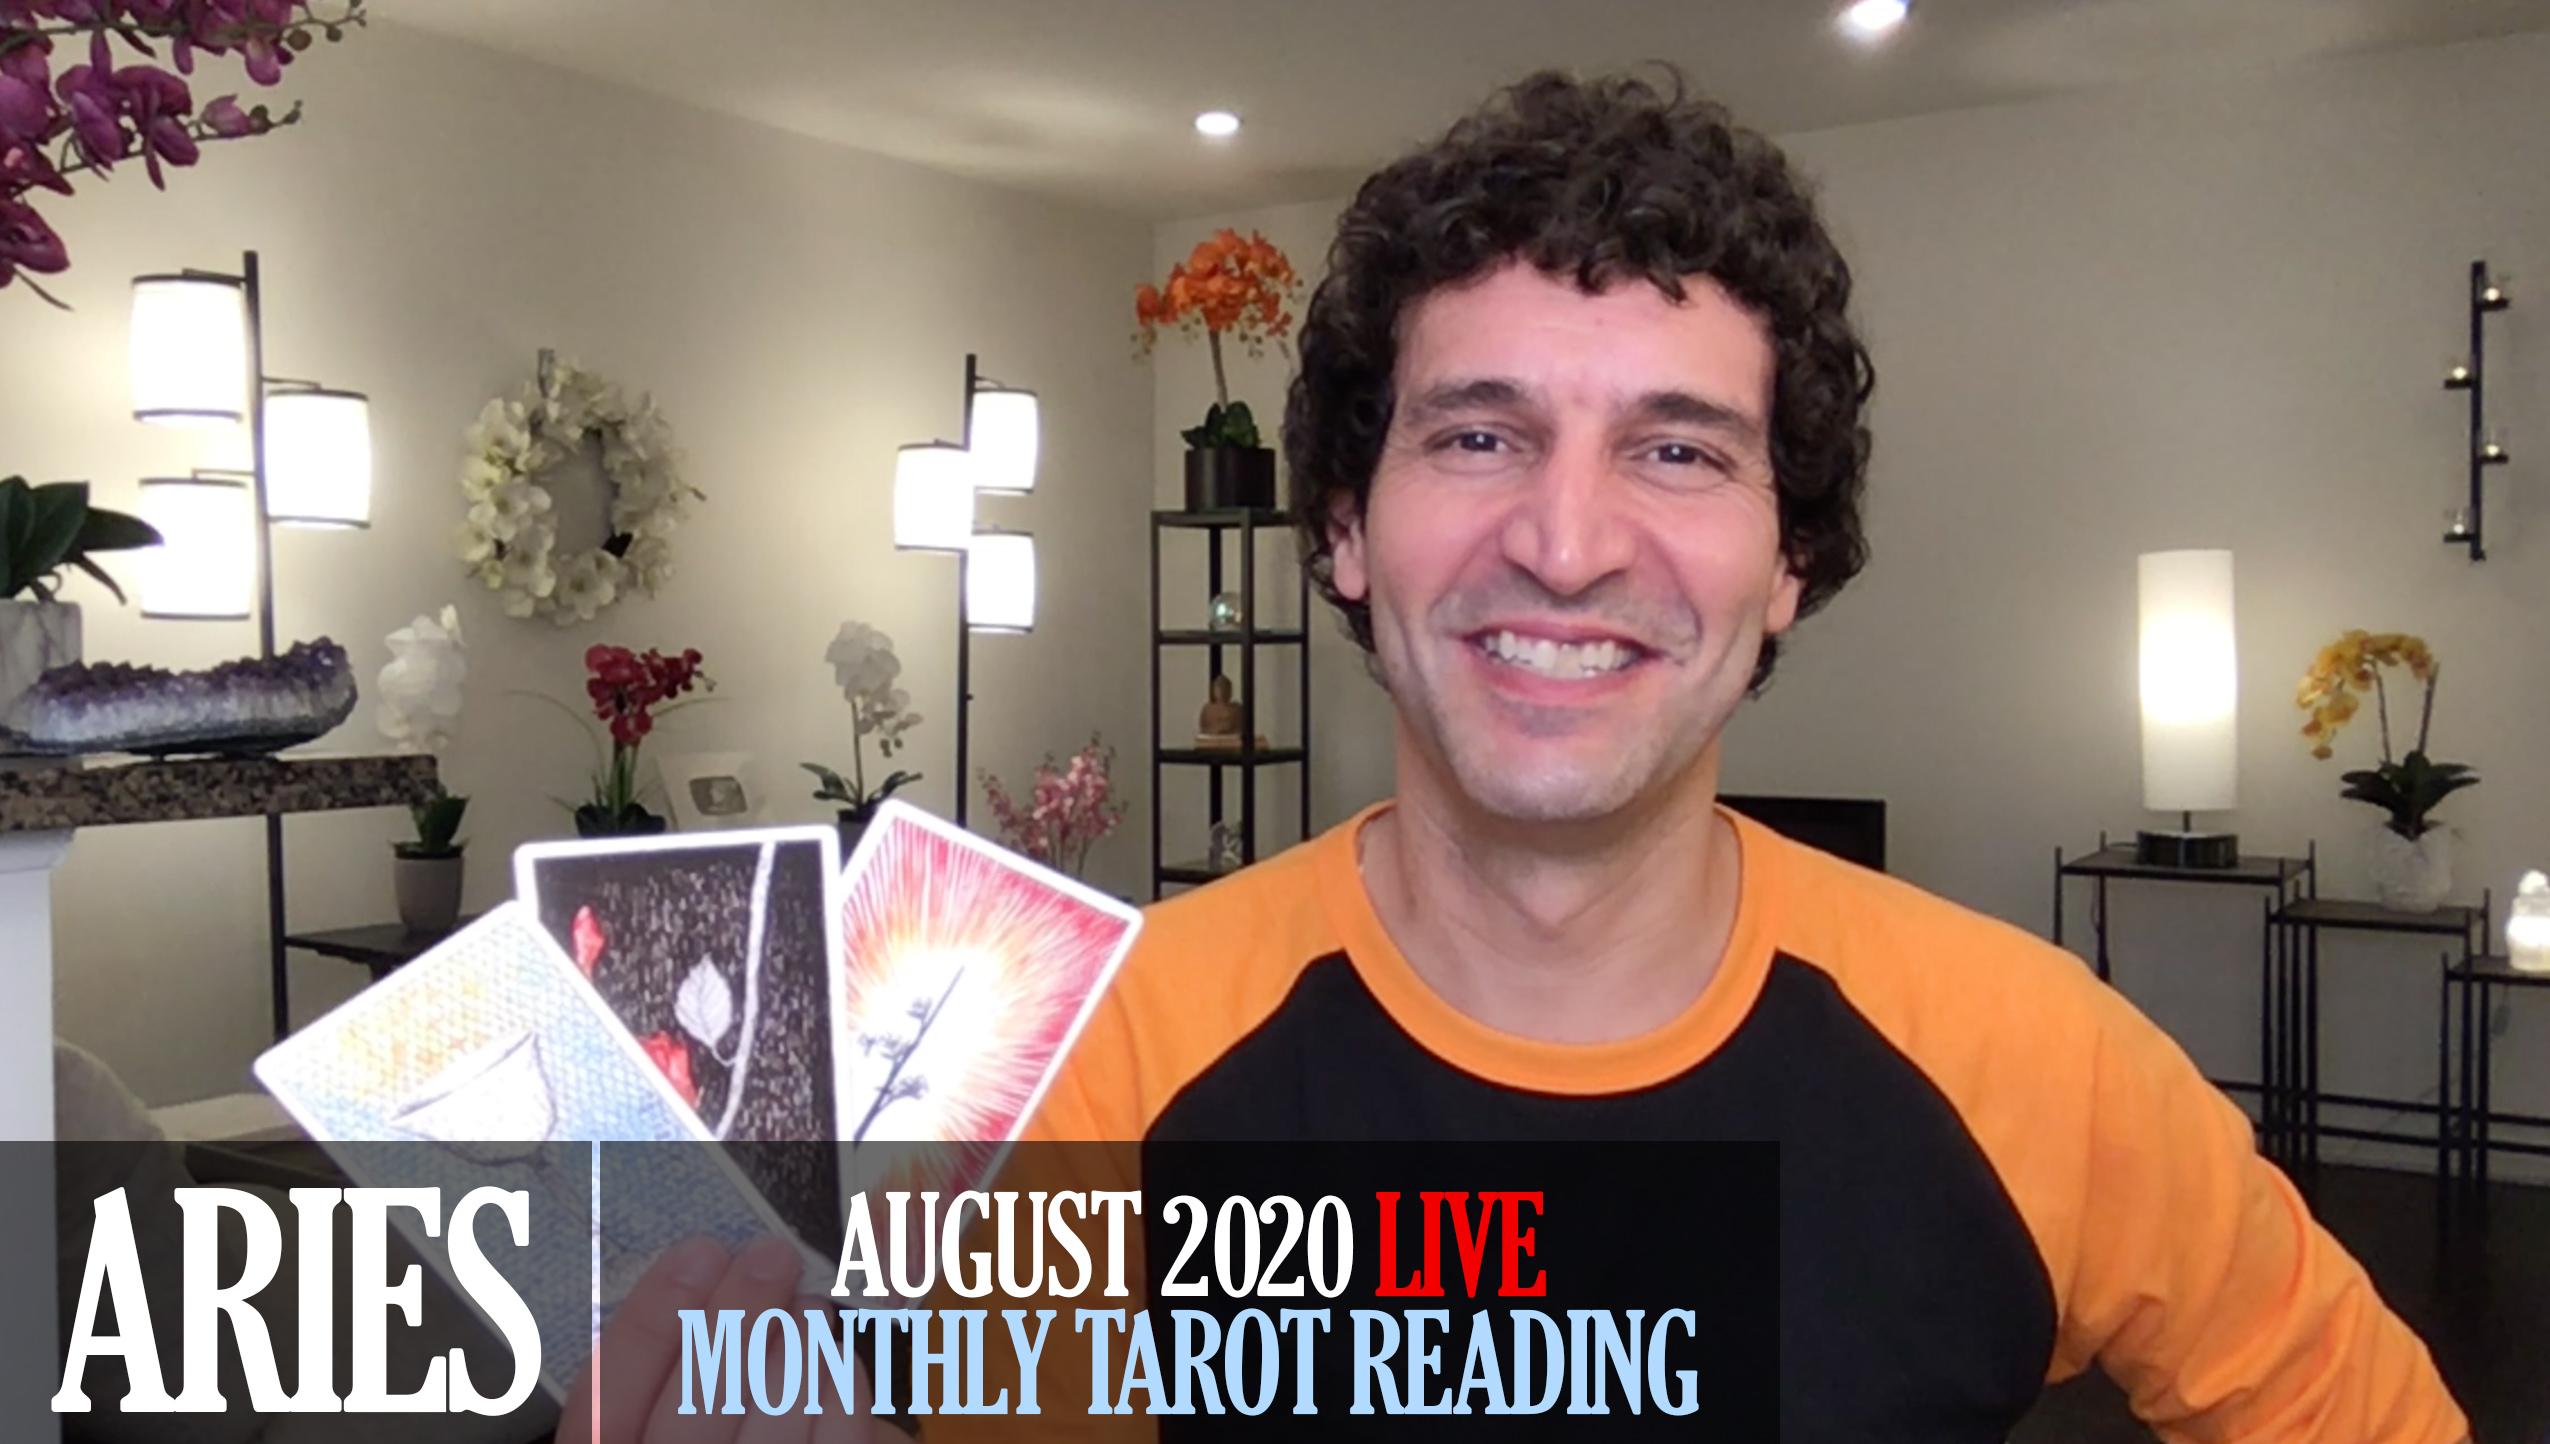 Aries August 2020 Tarot Reading